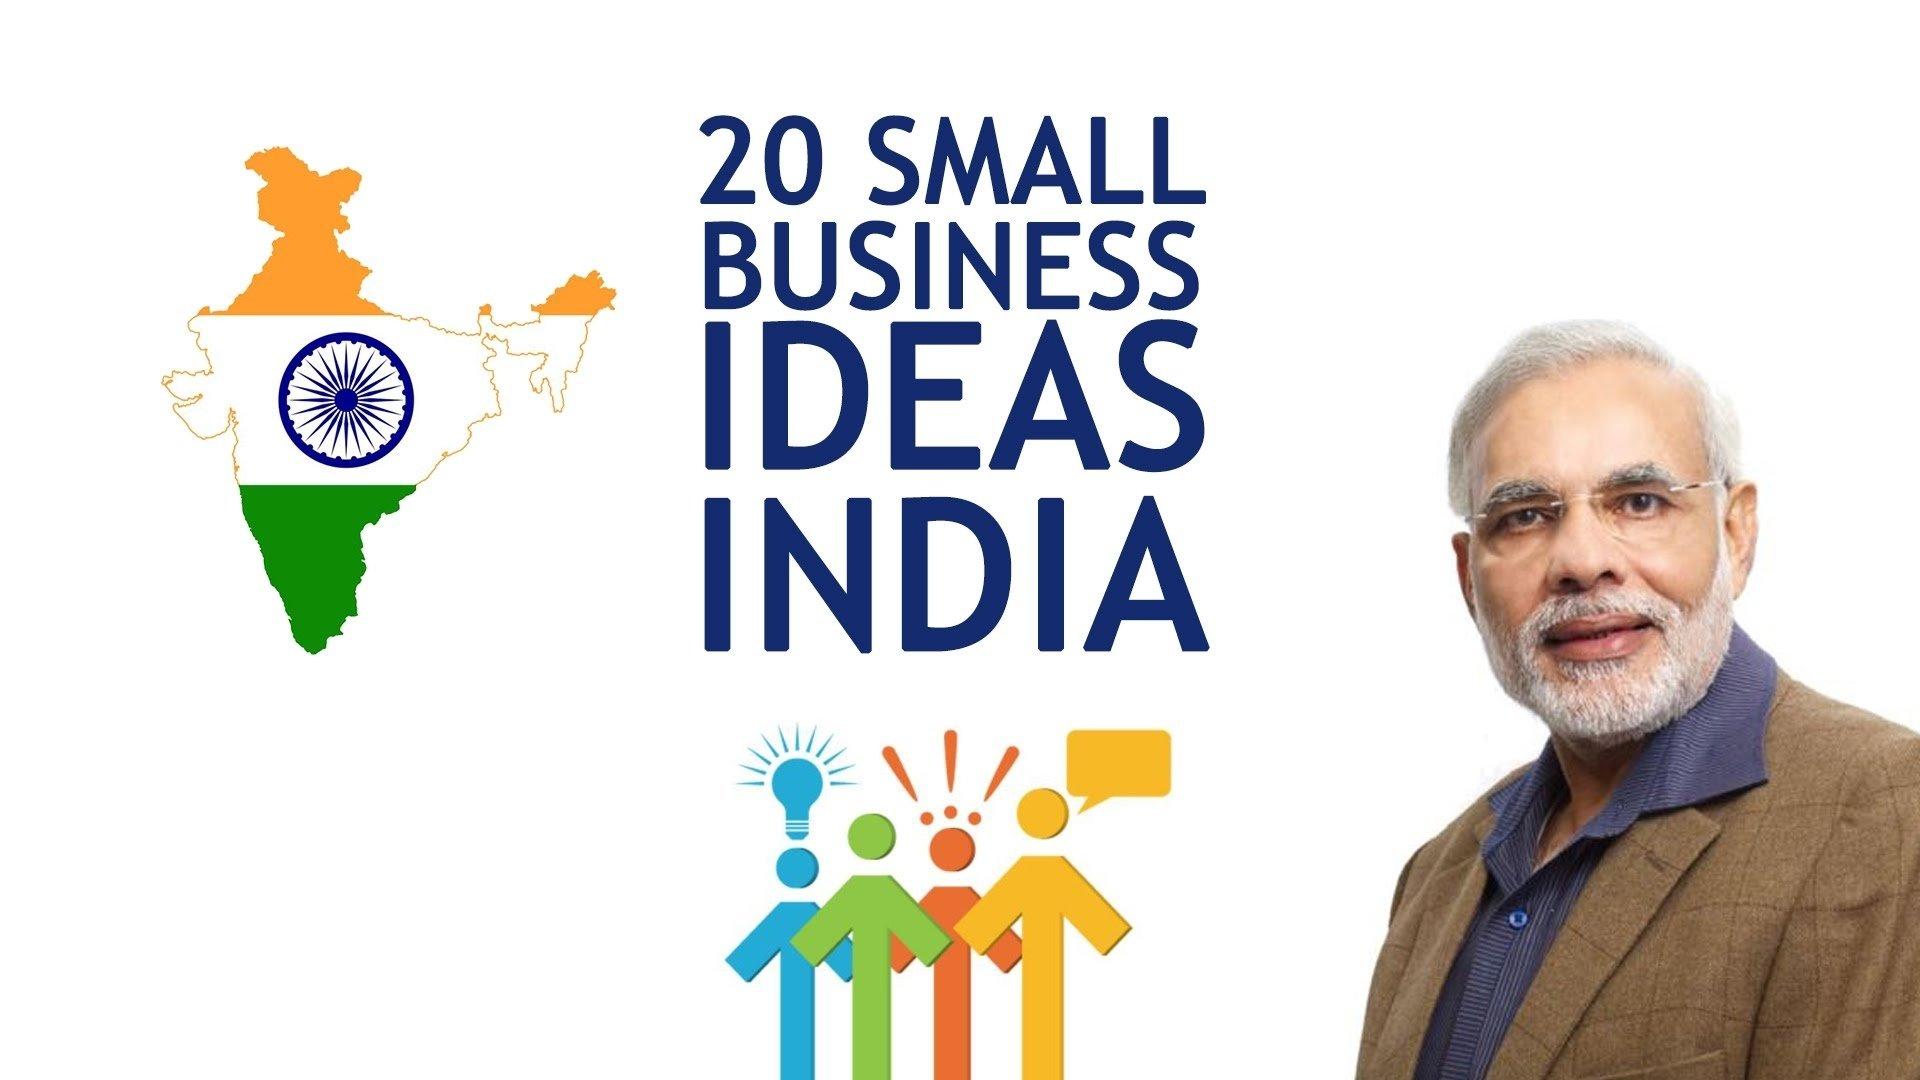 10 Stunning Best New Small Business Ideas top 20 best small business ideas in india youtube 5 2021